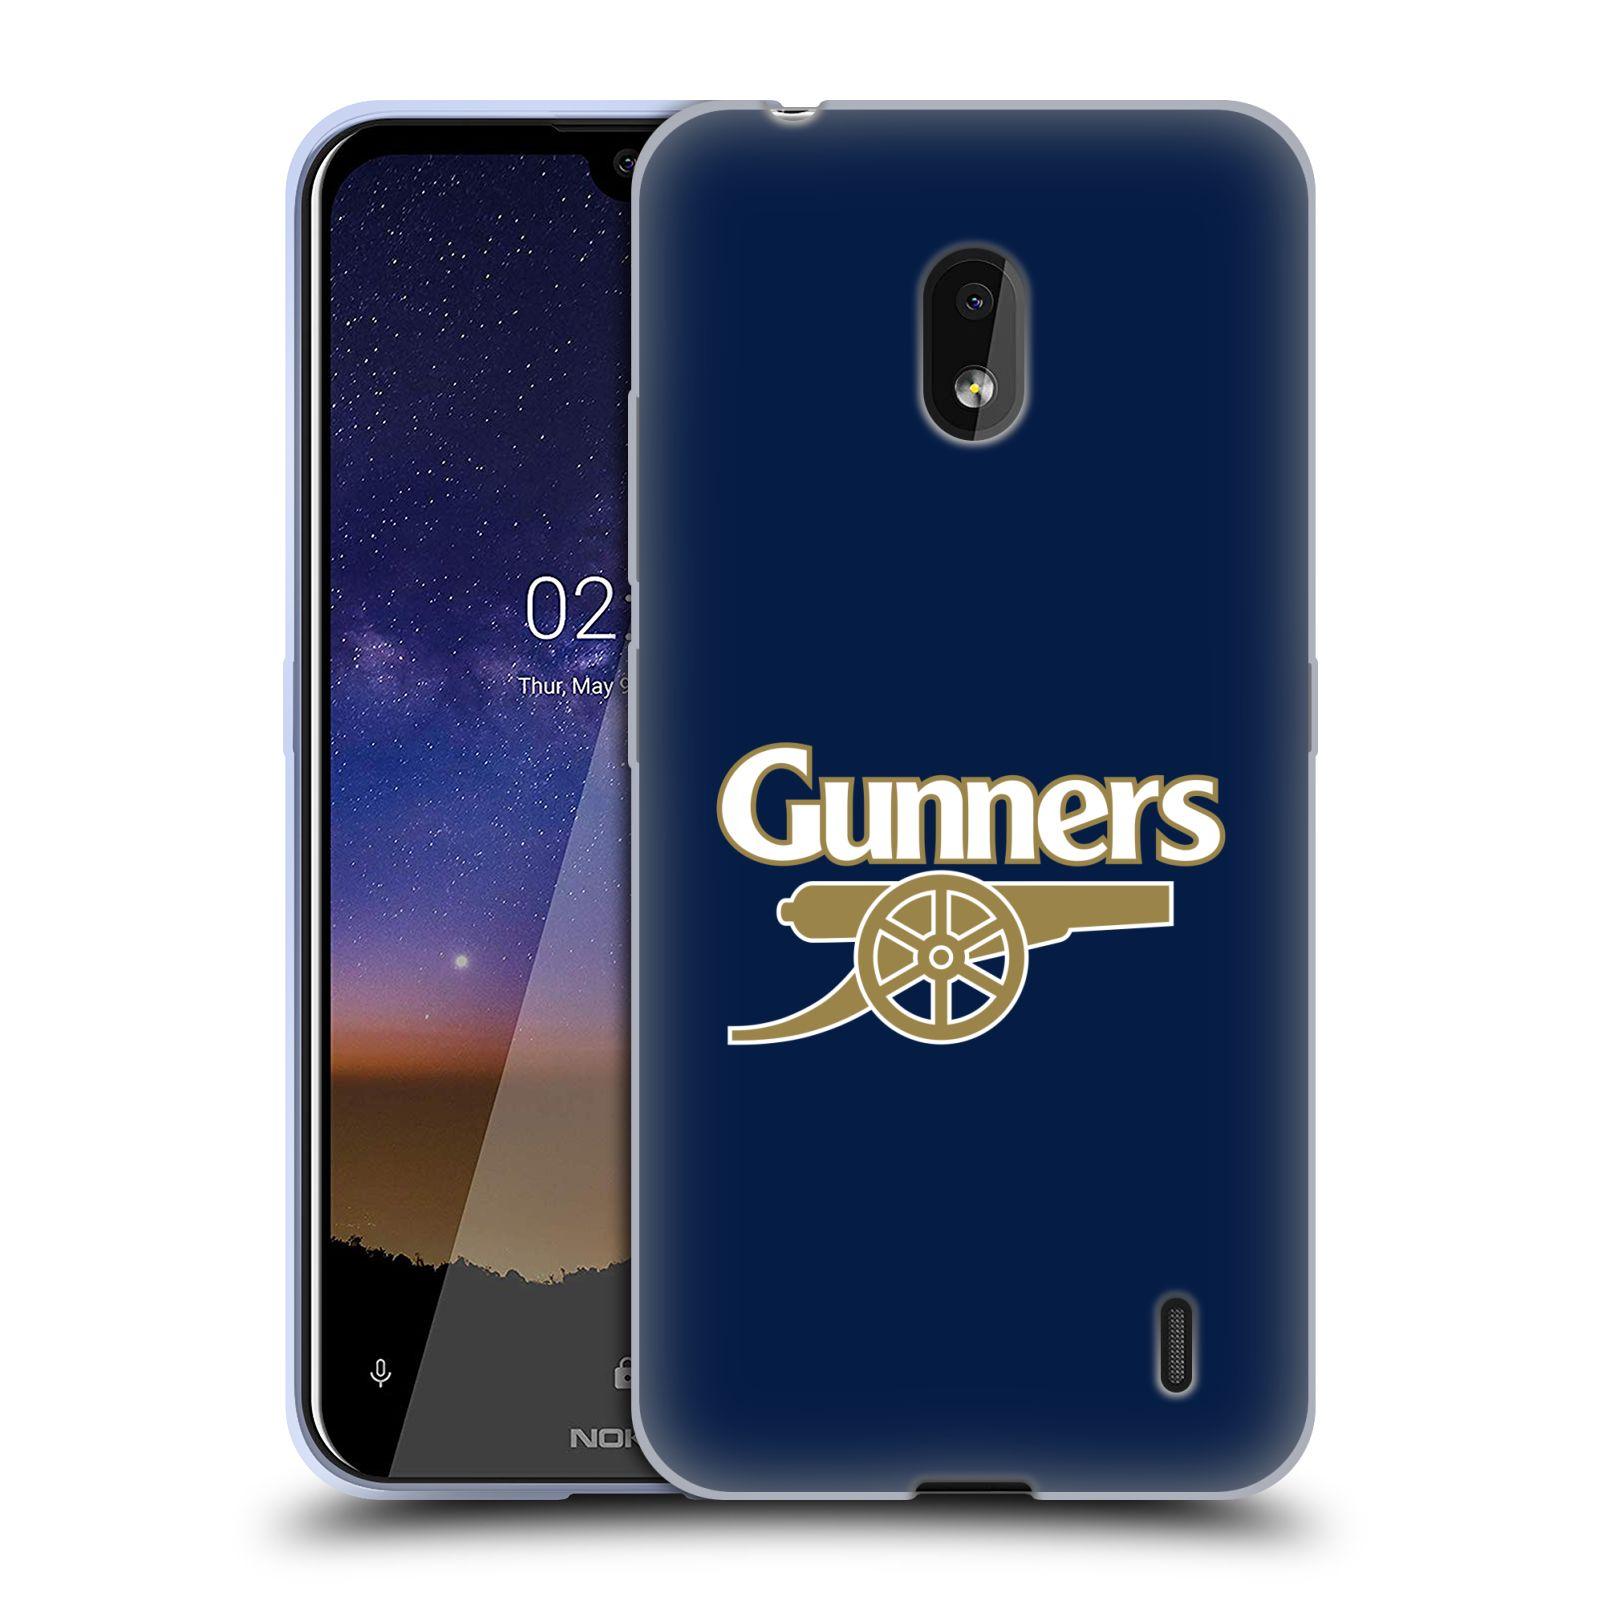 Silikonové pouzdro na mobil Nokia 2.2 - Head Case - Arsenal FC - Gunners